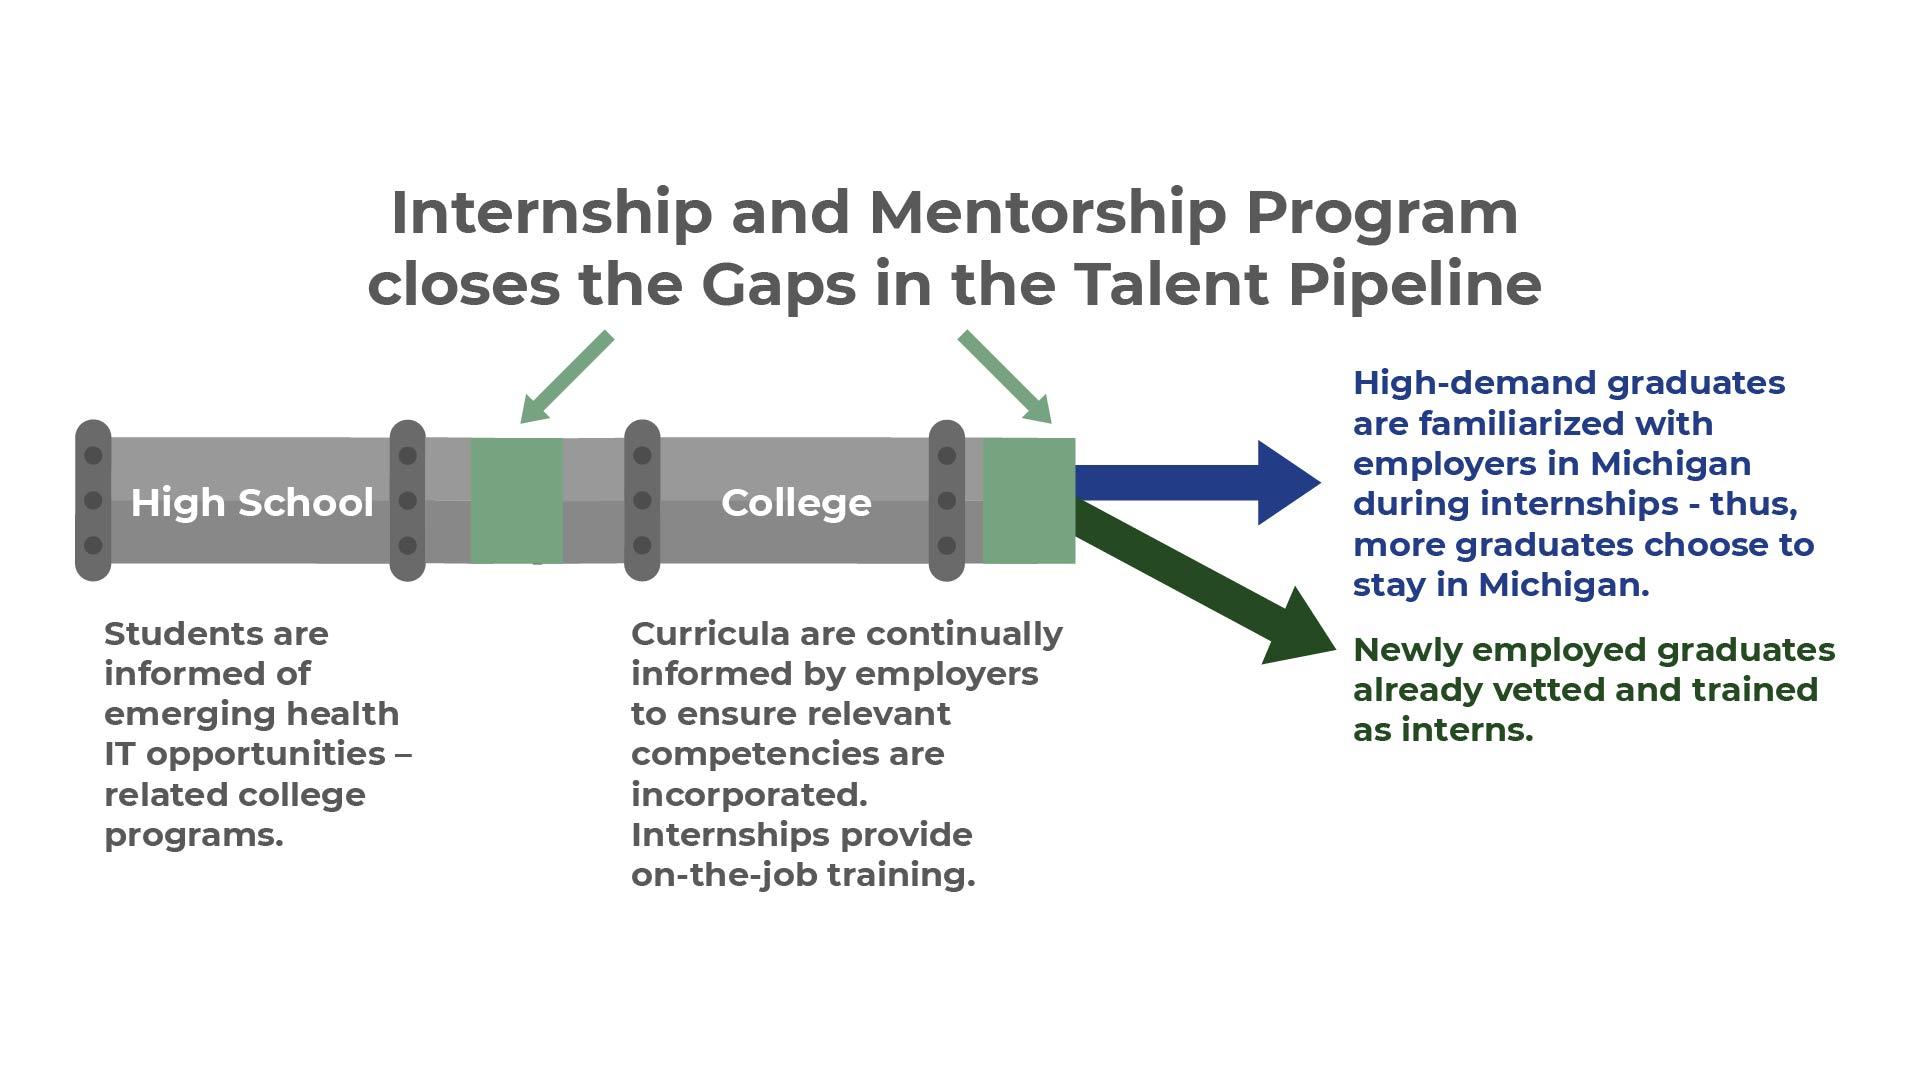 Interoperability Institute Talent Pipeline_GapsClosed